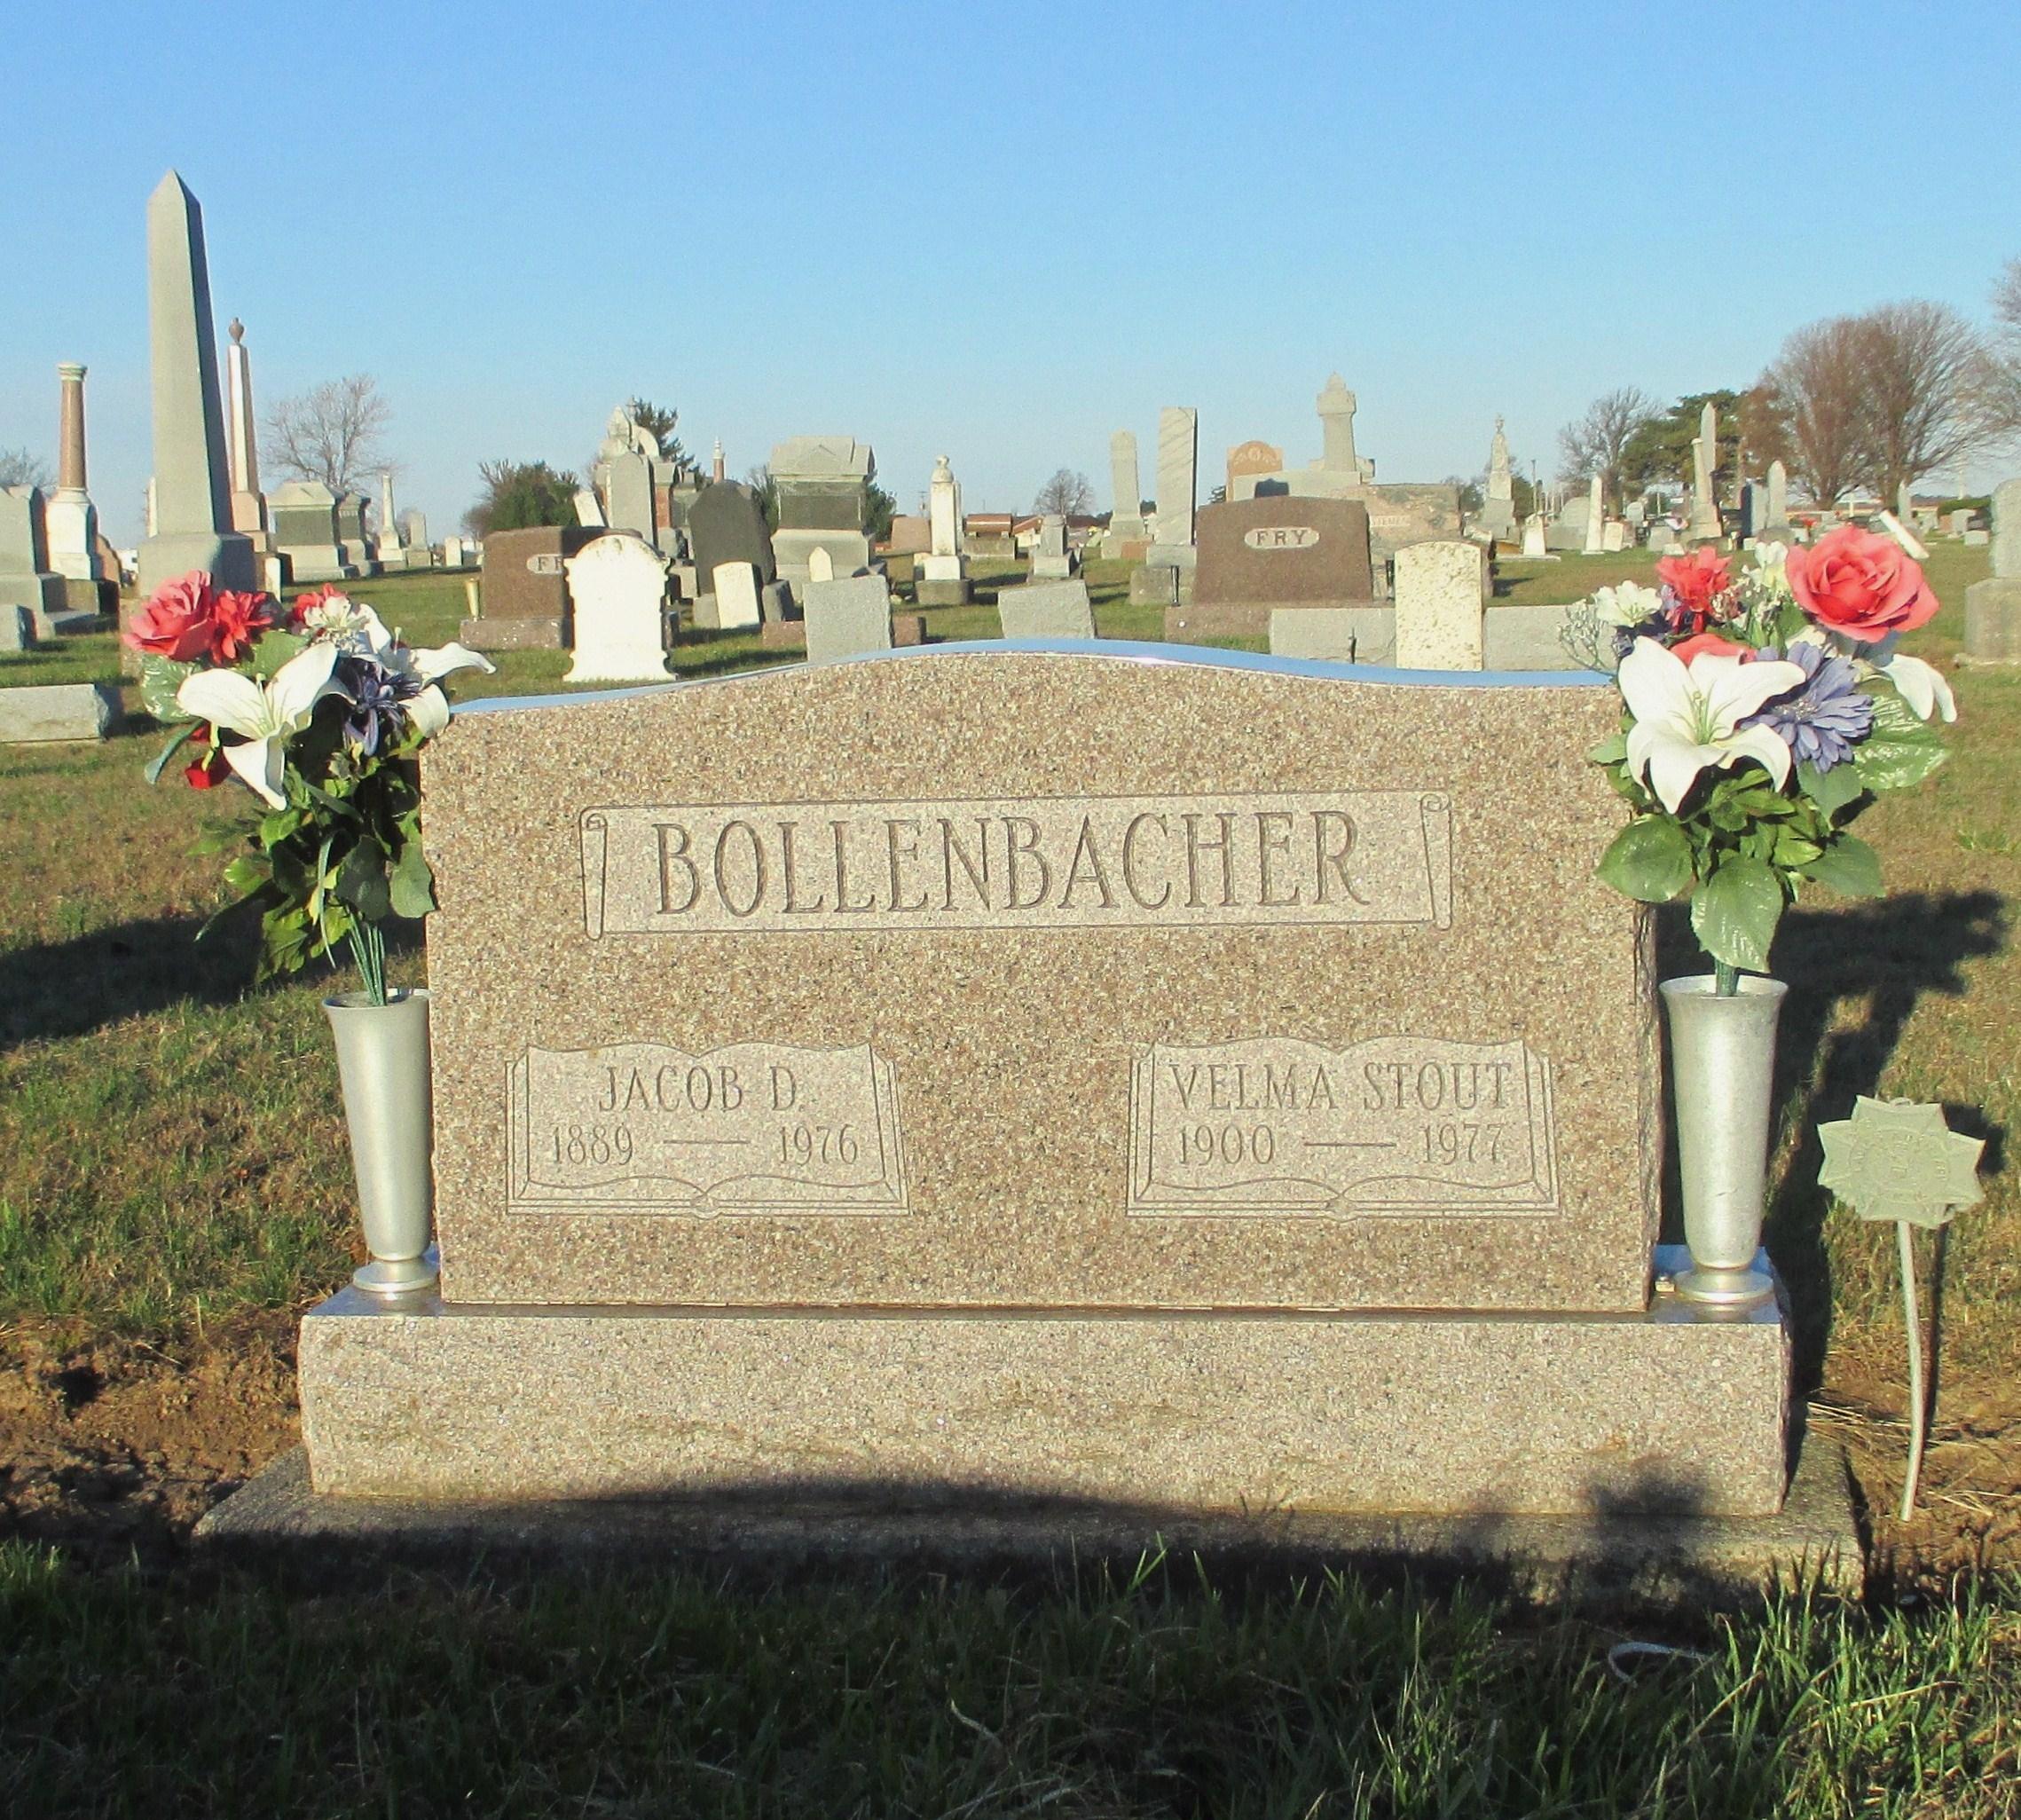 Jacob Dewald Bollenbacher